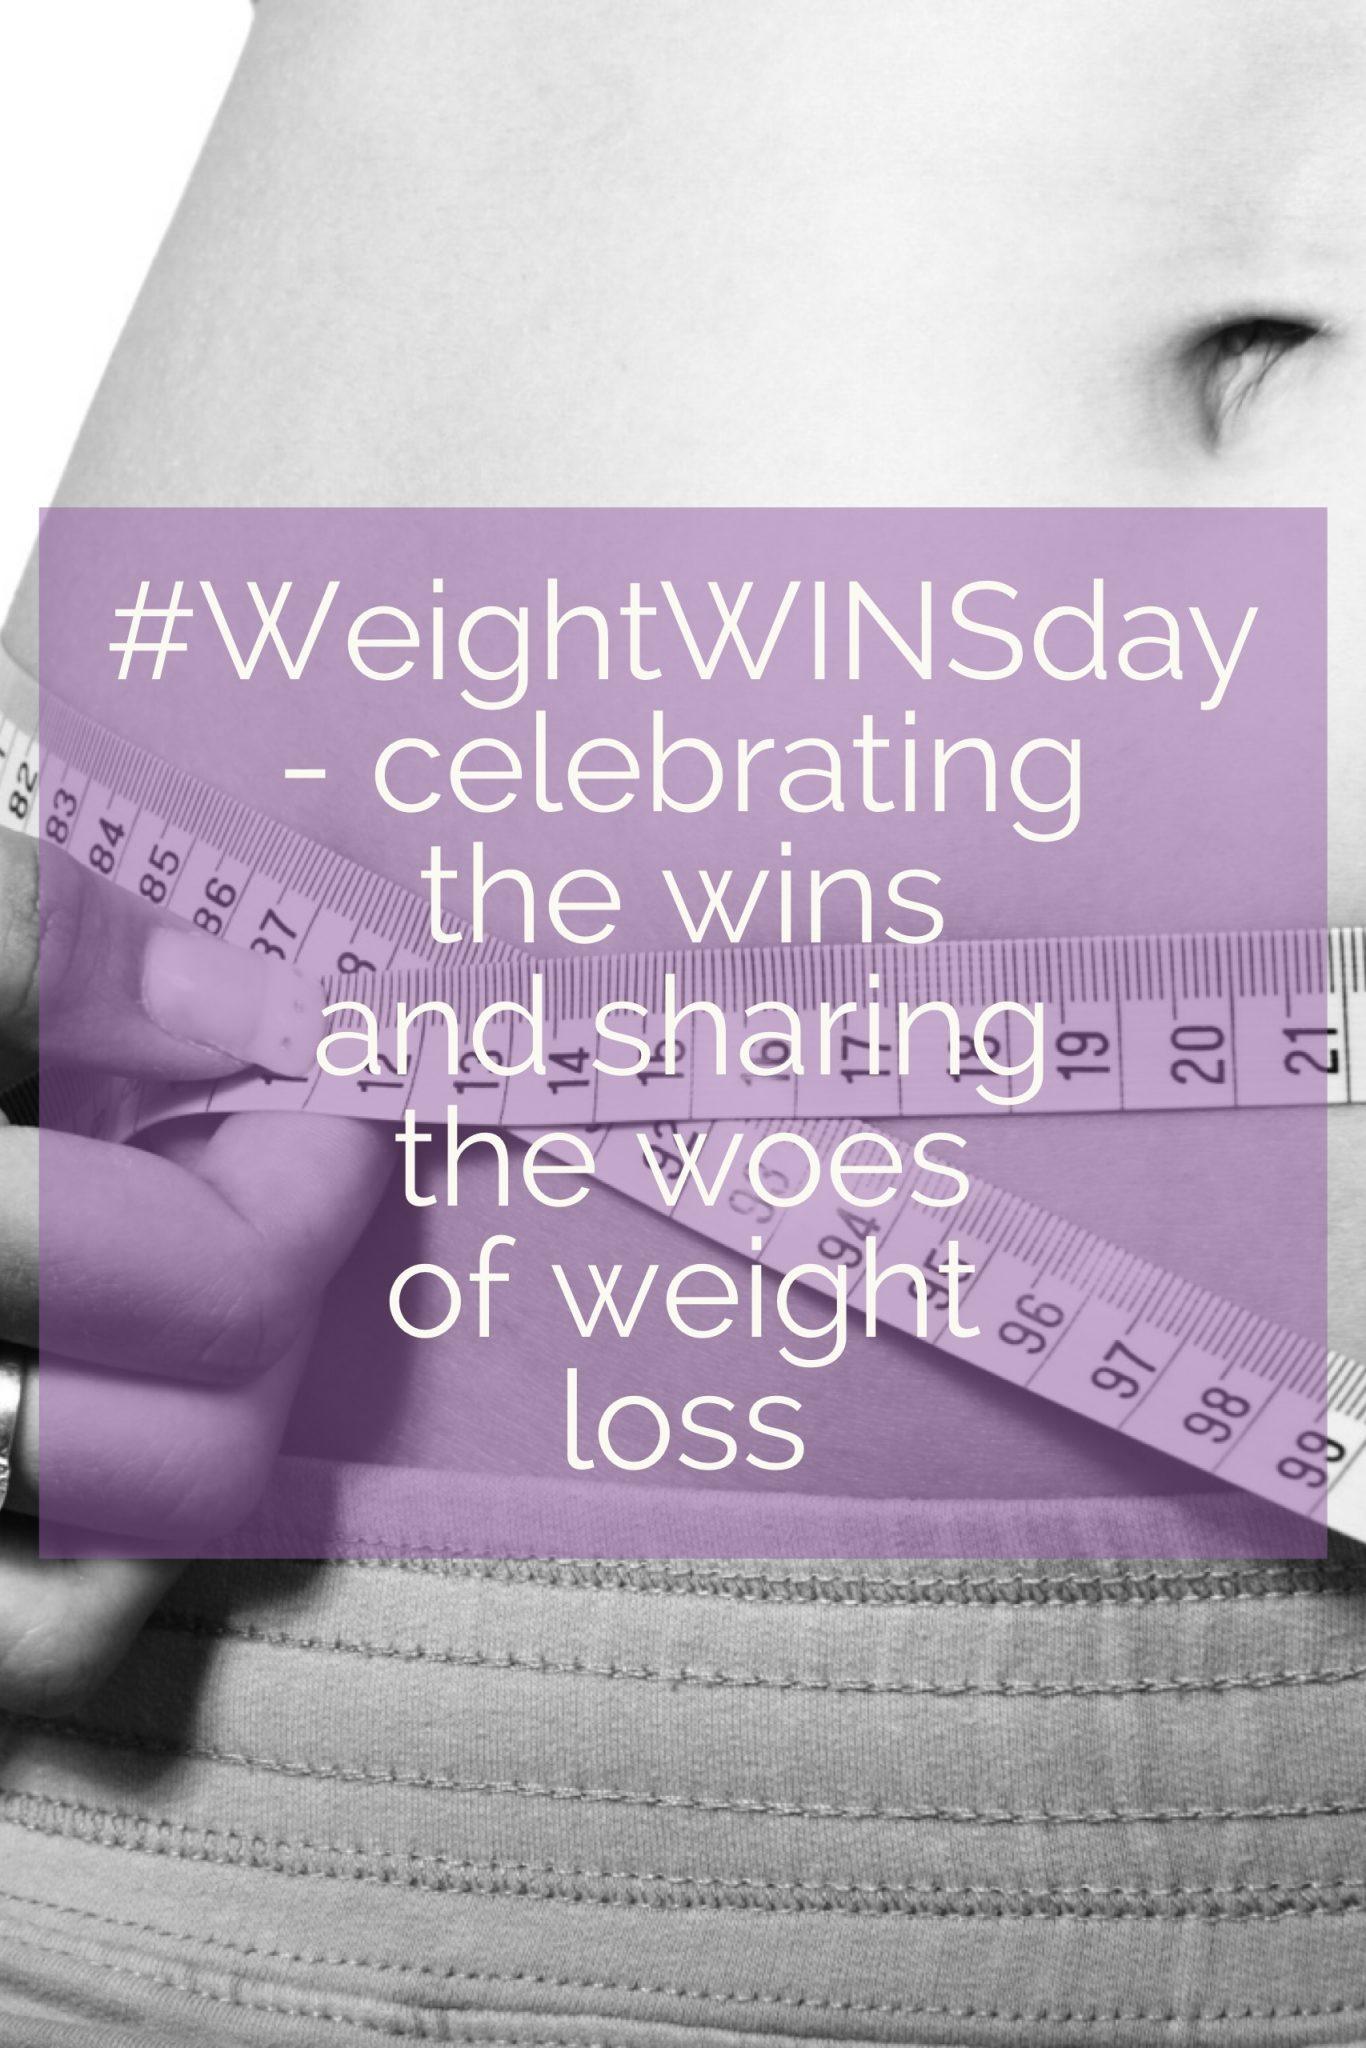 Introducing #WeightWINSday